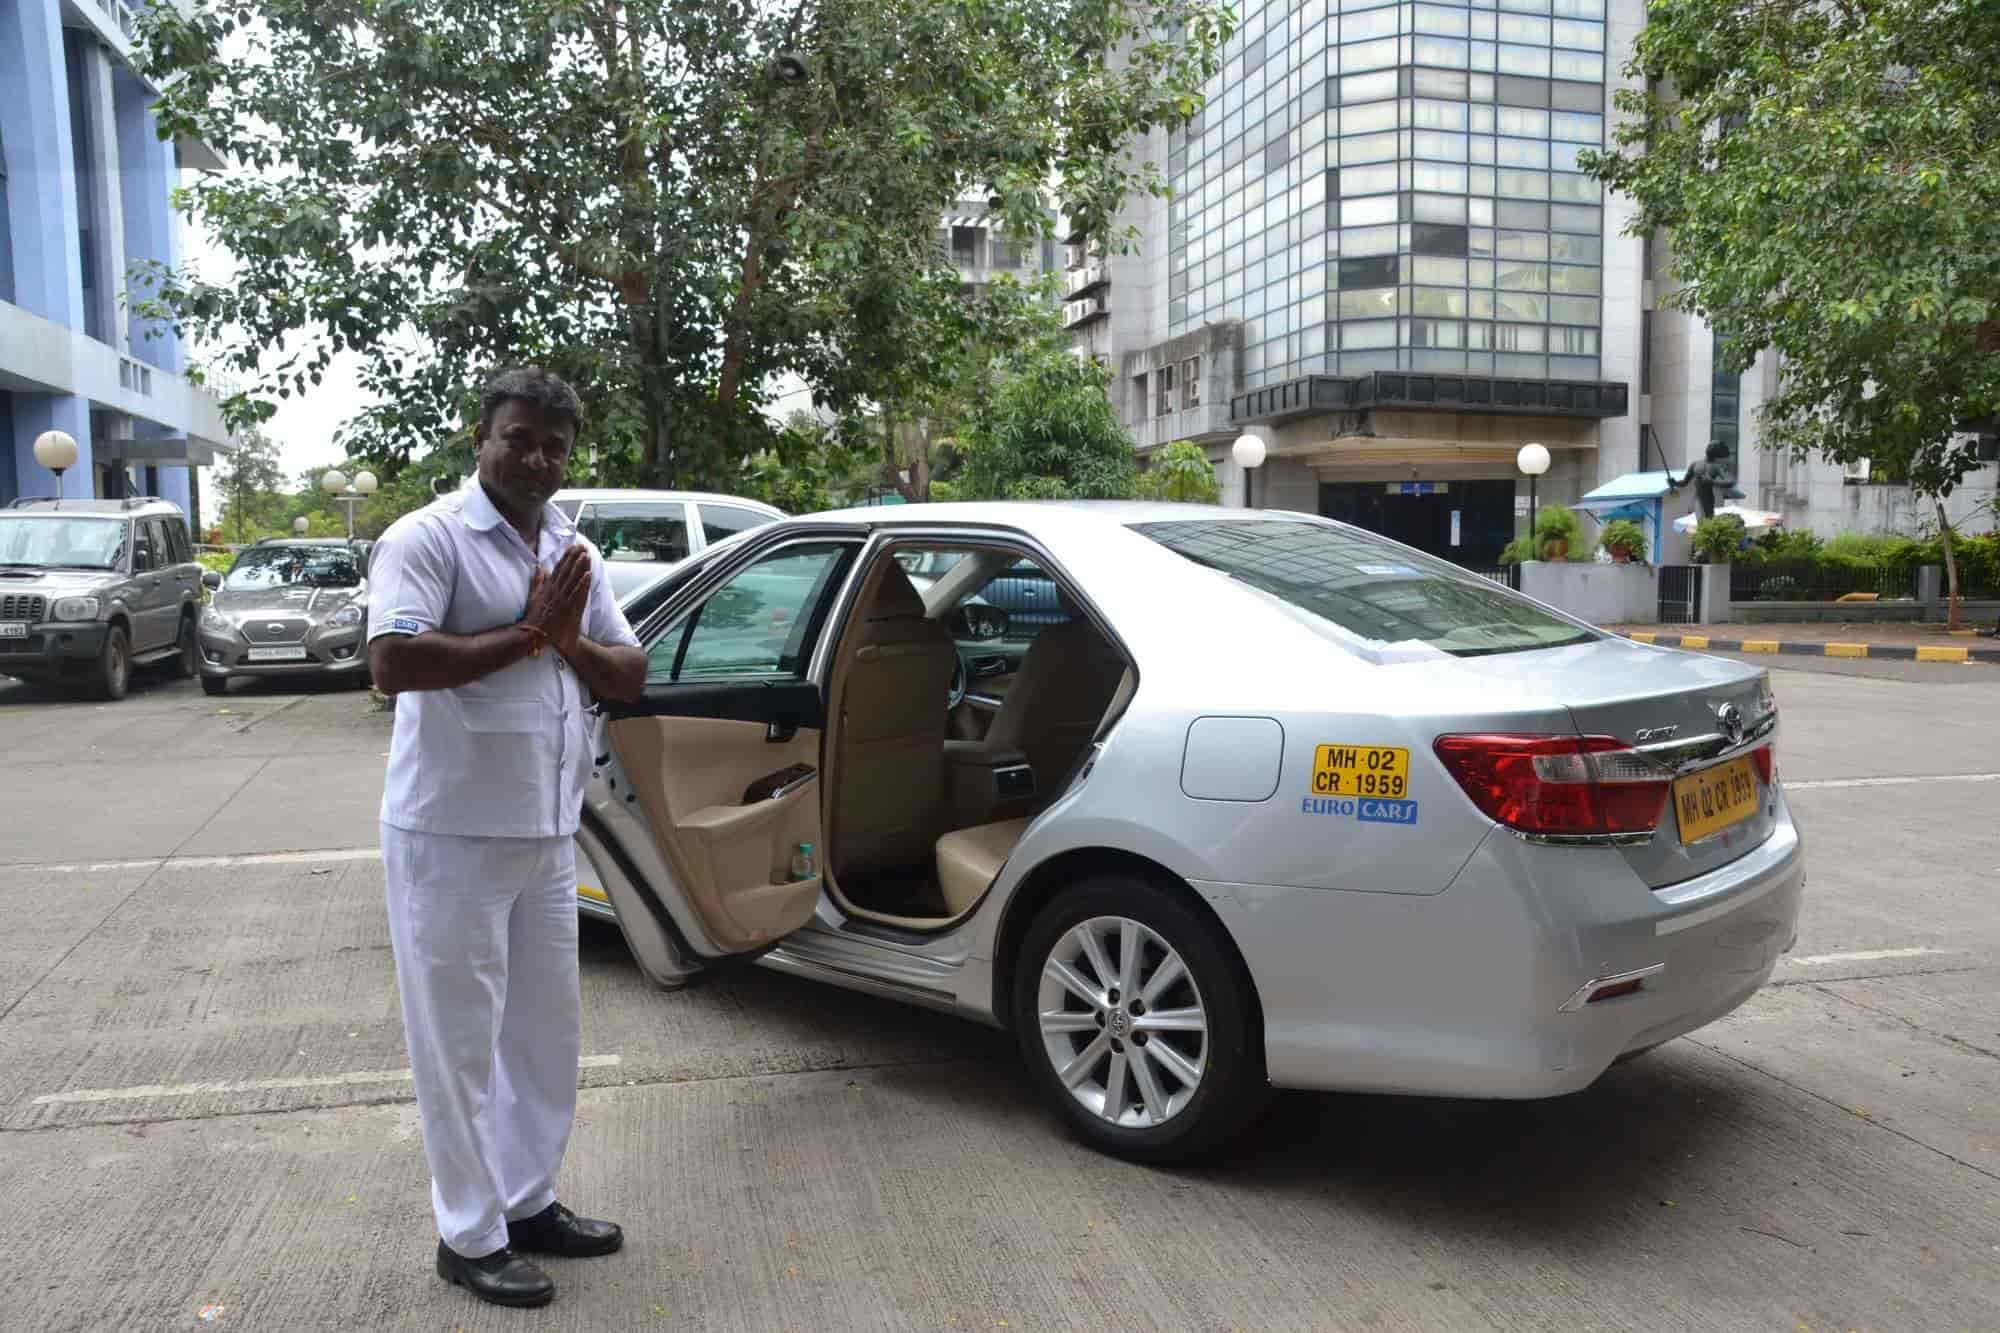 Euro Cars Bandra East Car Hire For Delhi In Mumbai Justdial